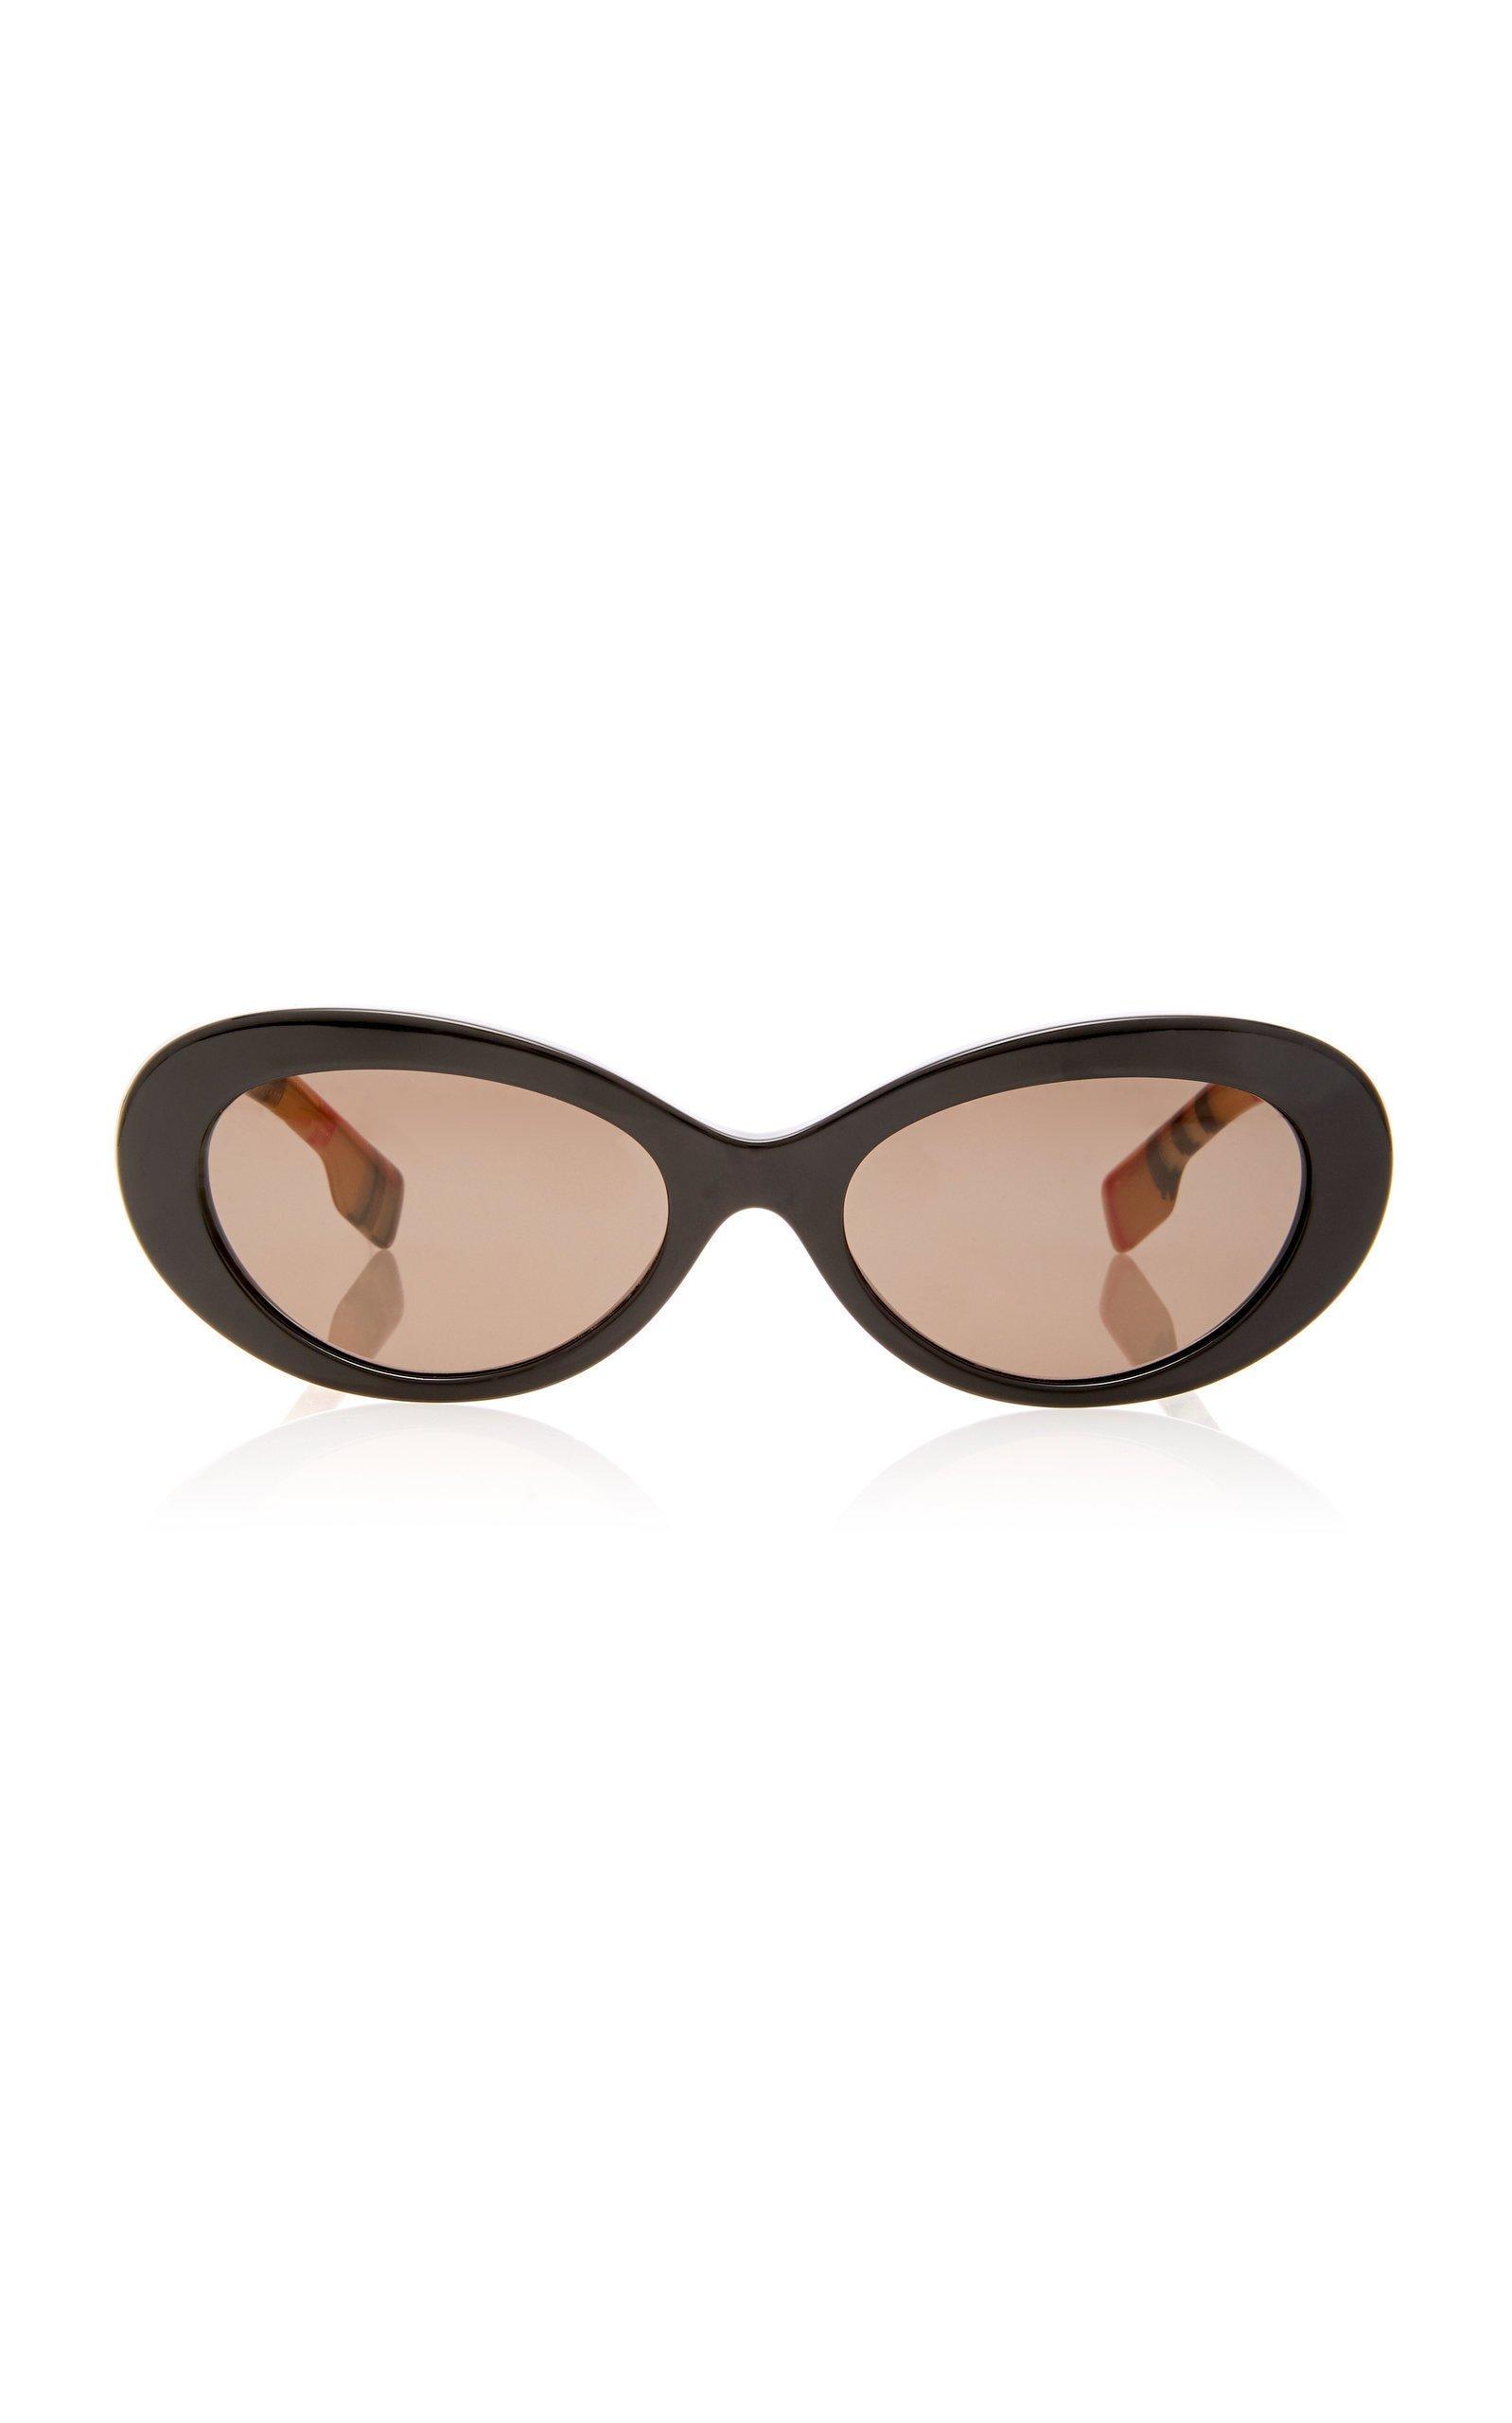 Burberry Oval-Frame Acetate Sunglasses